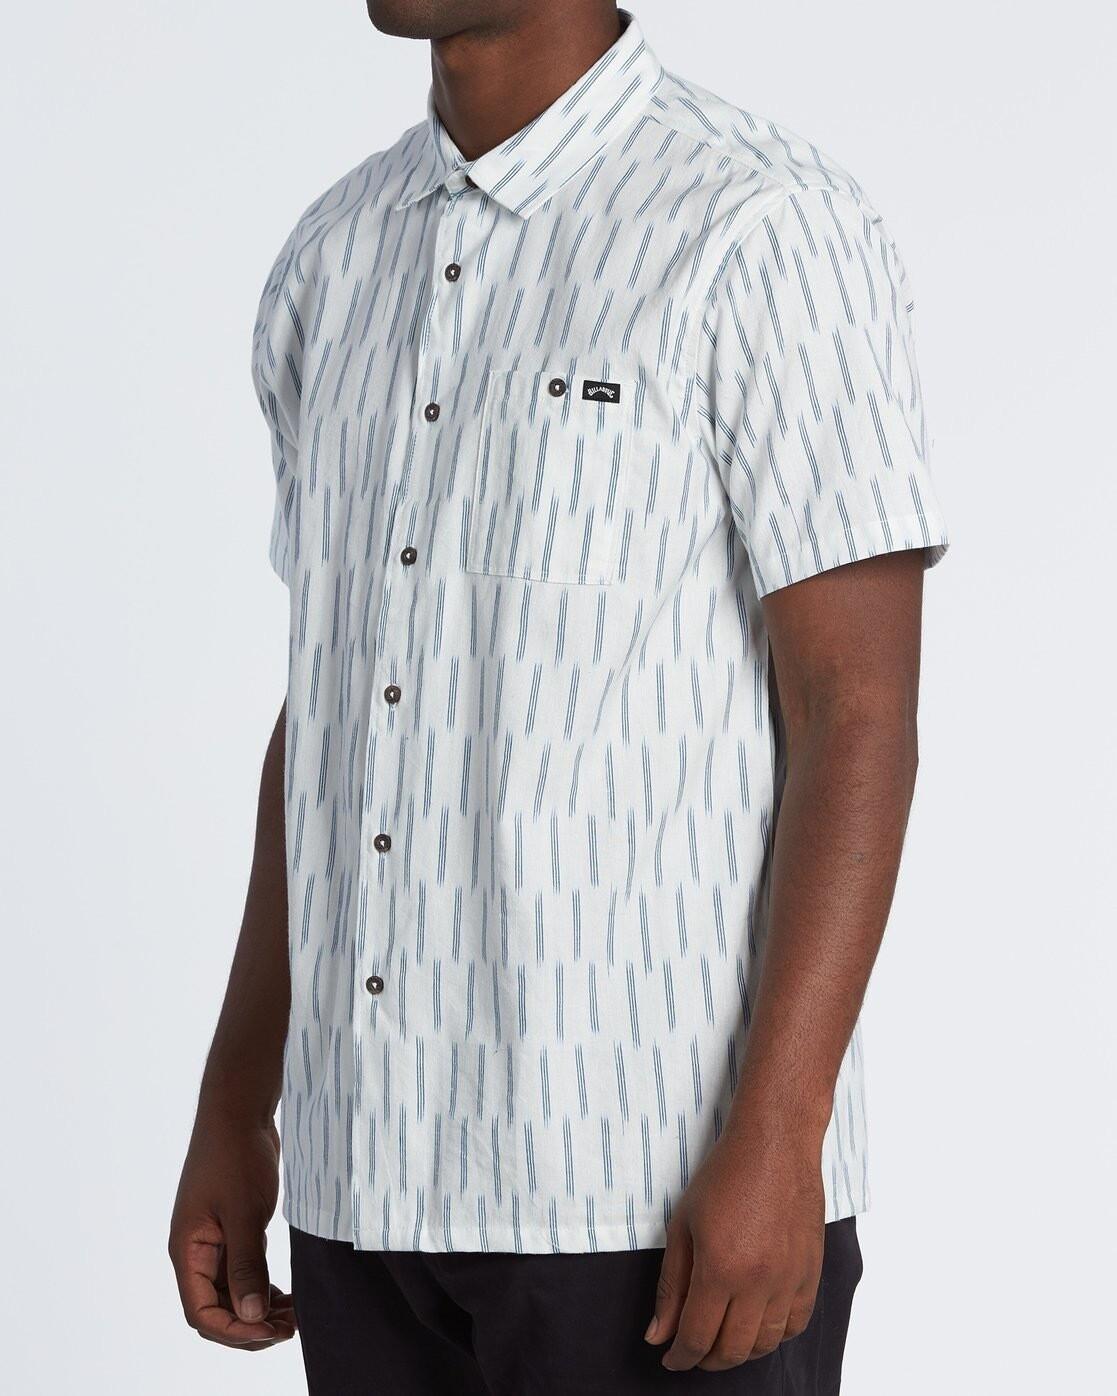 Billabong Sunday's Shirt Ivory/Navy